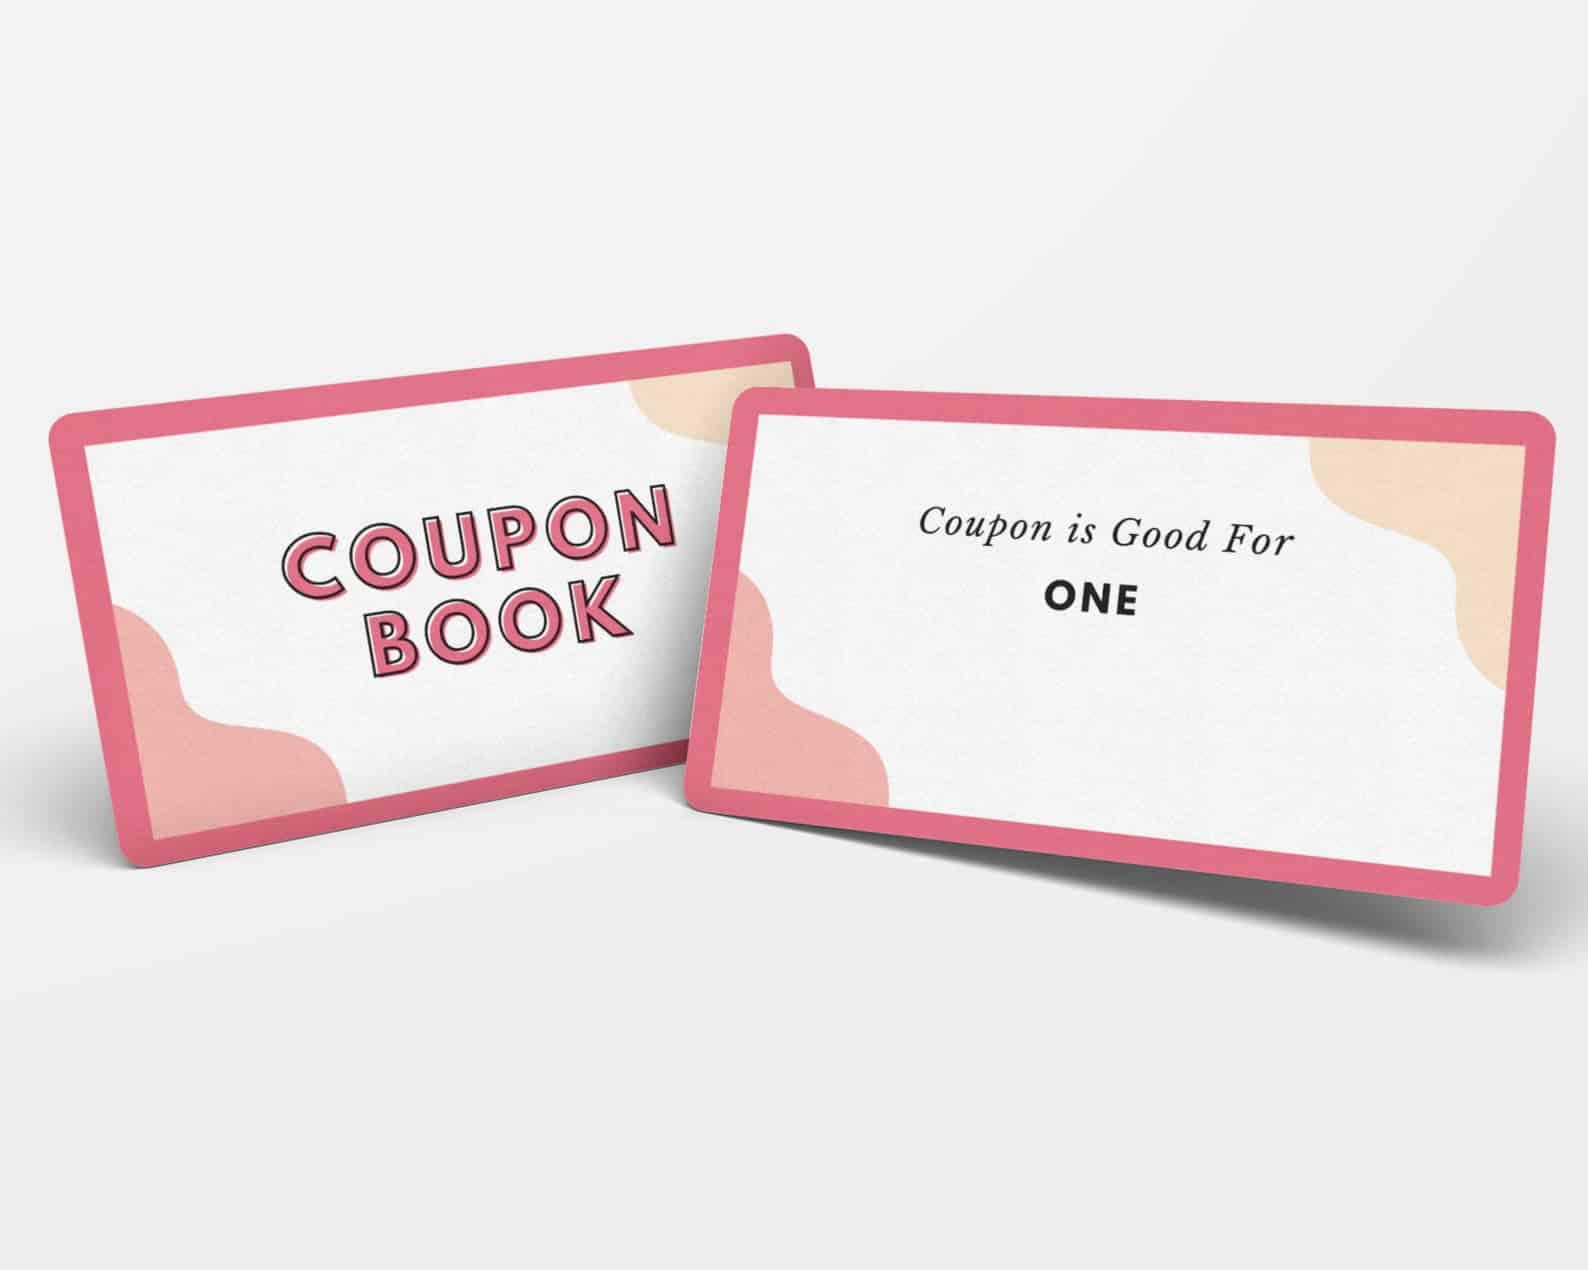 General Coupon Book